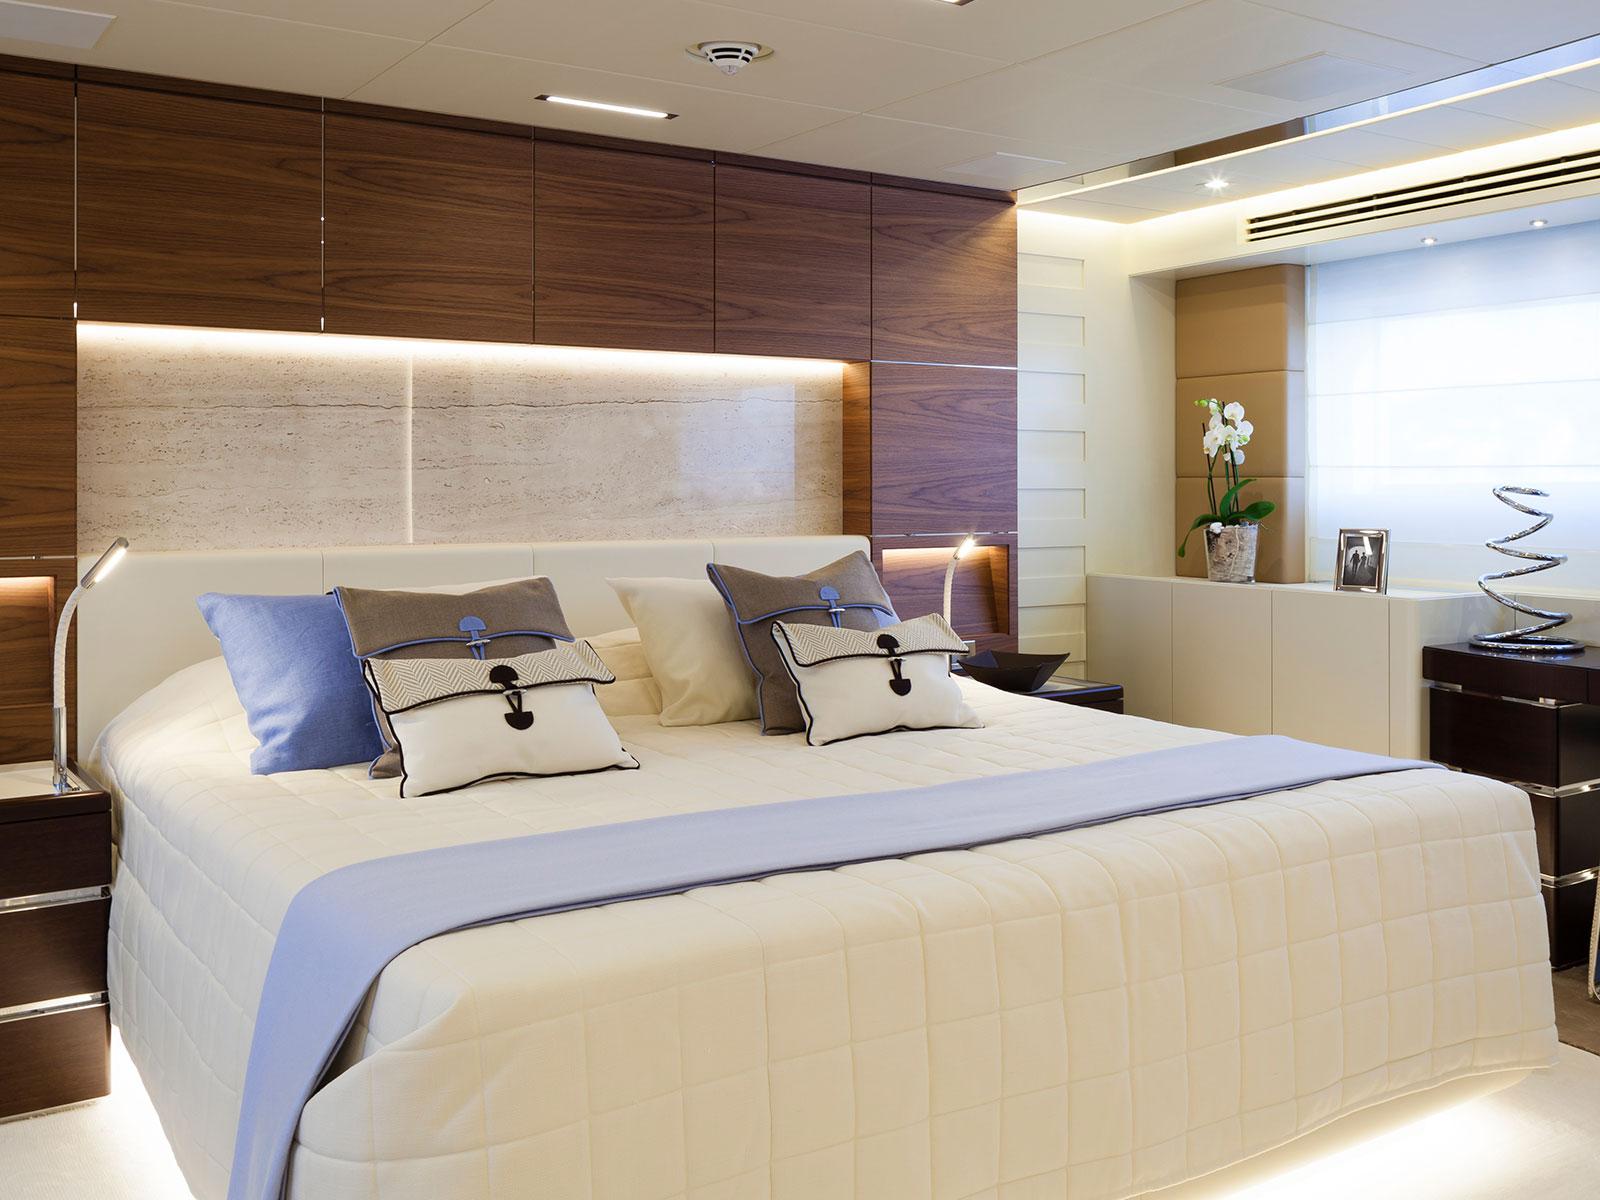 Amore Mio bedroom